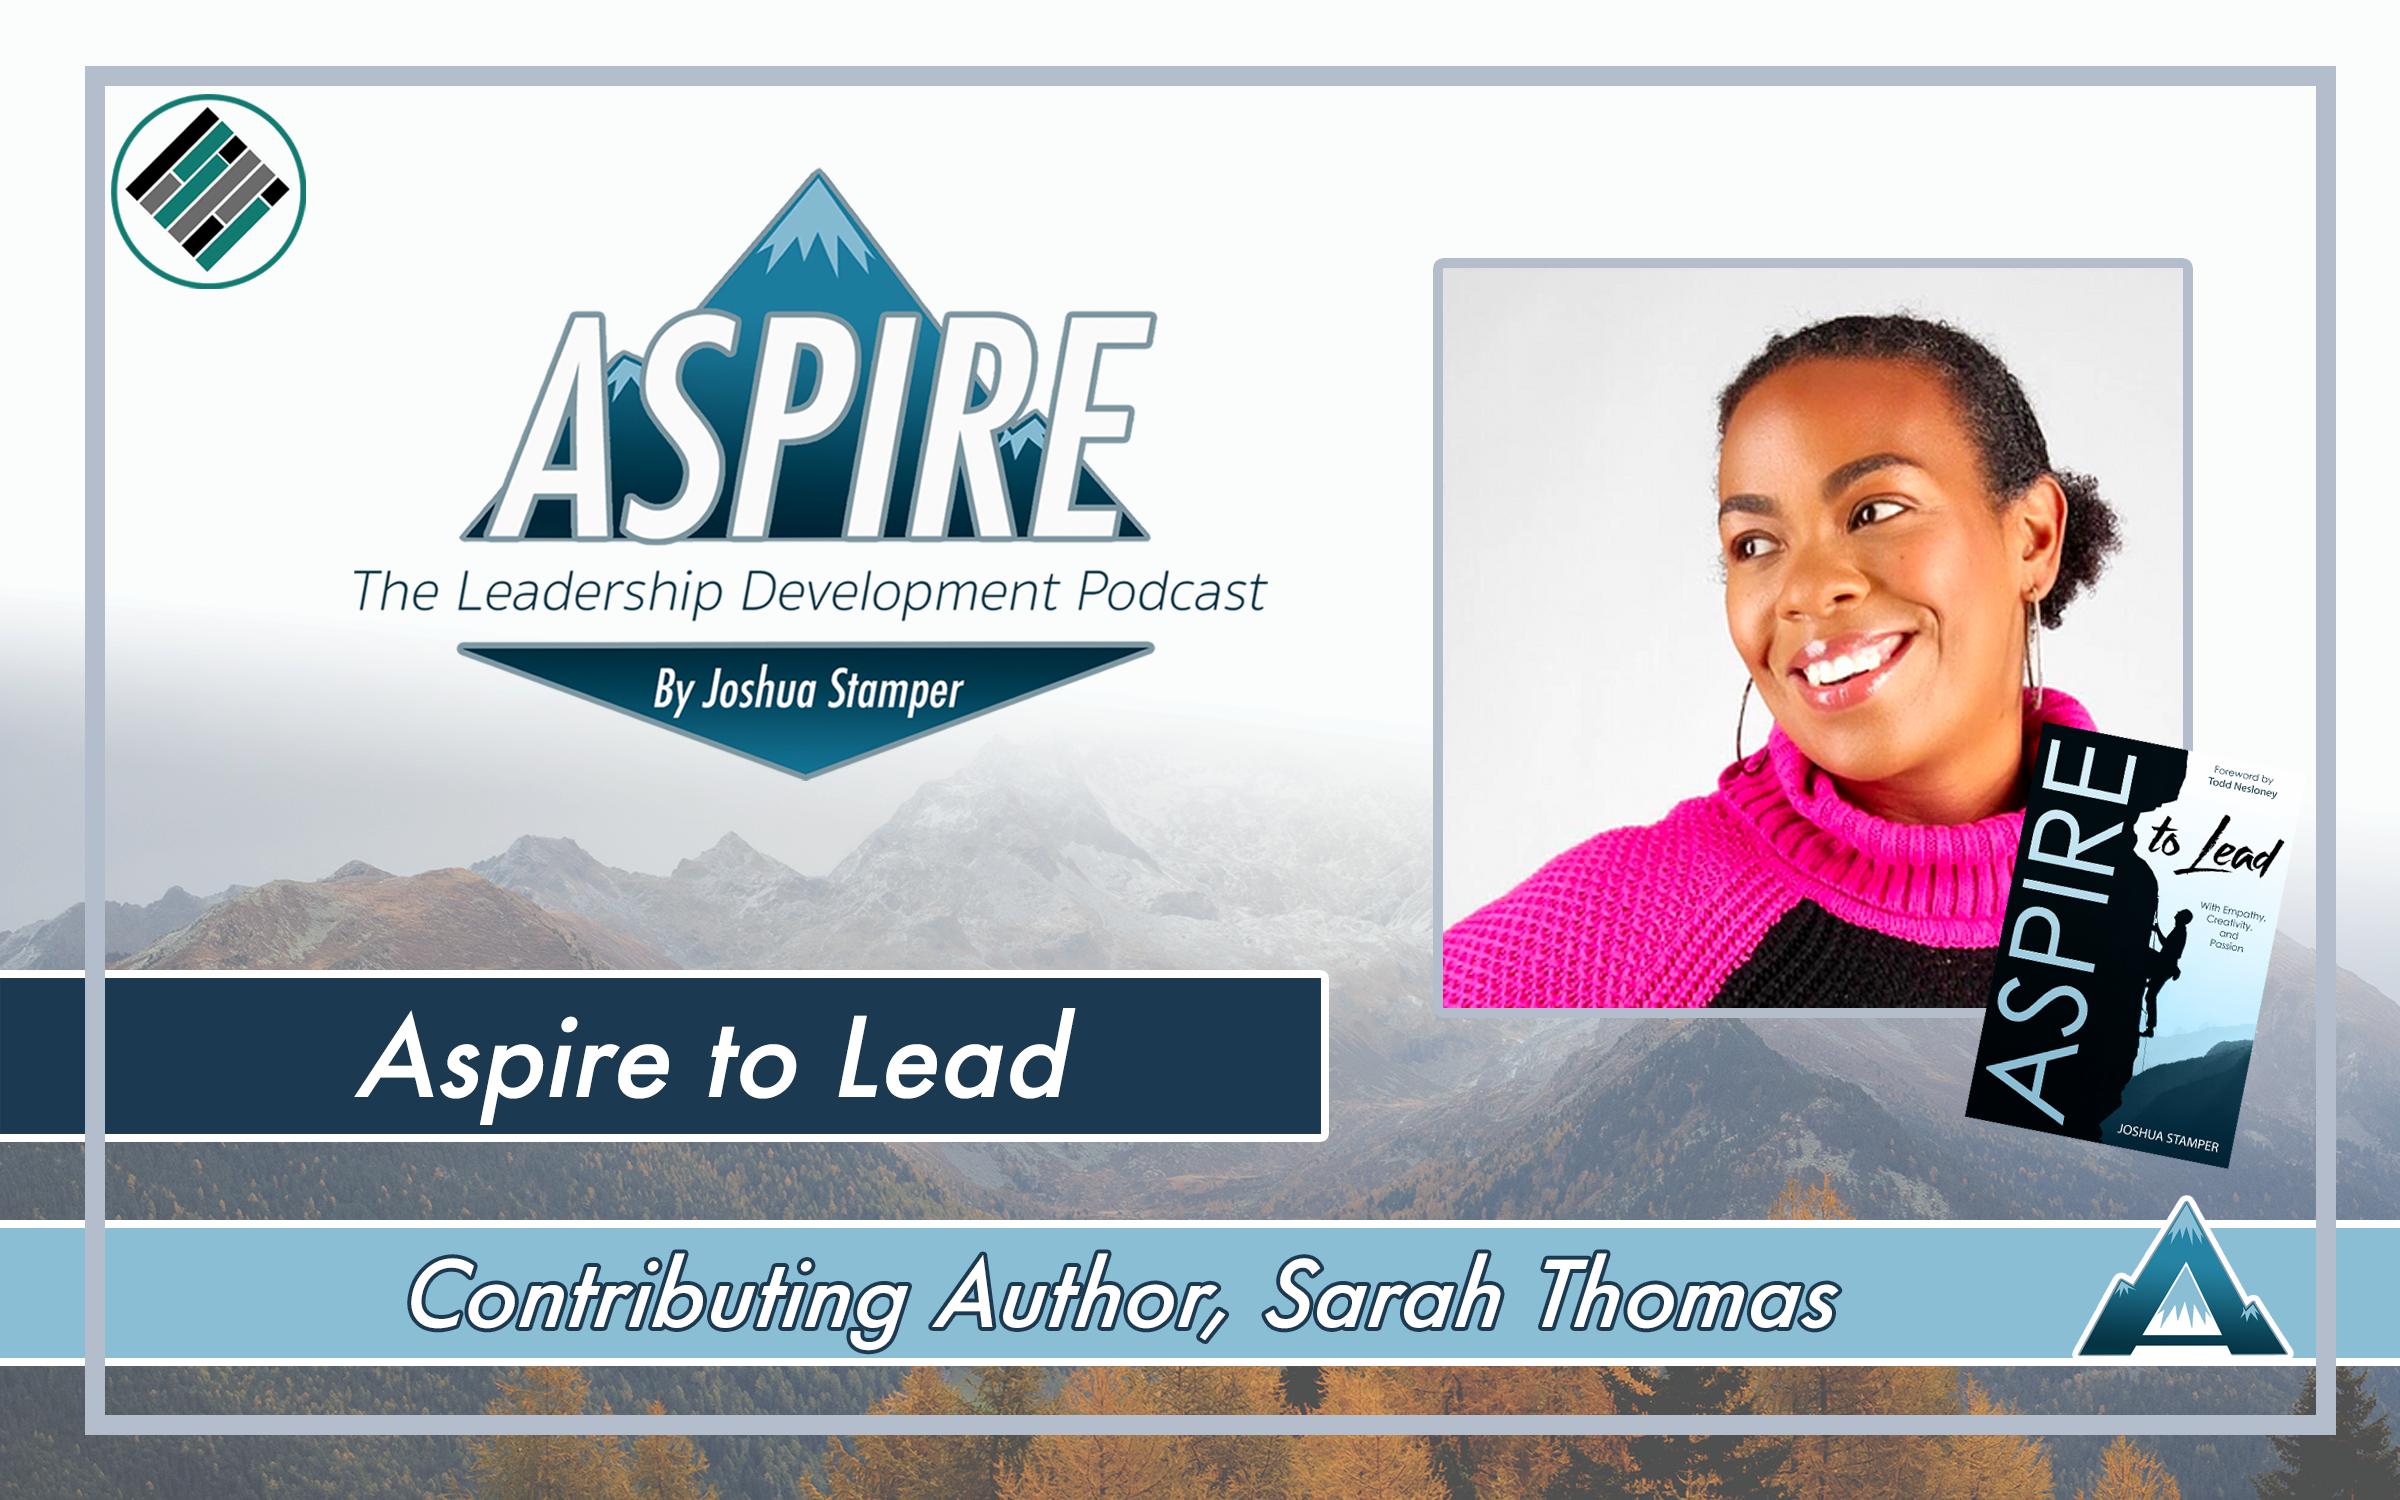 Aspire to Lead, Sarah Thomas, #AspireLead. Aspire: The Leadership Development Podcast